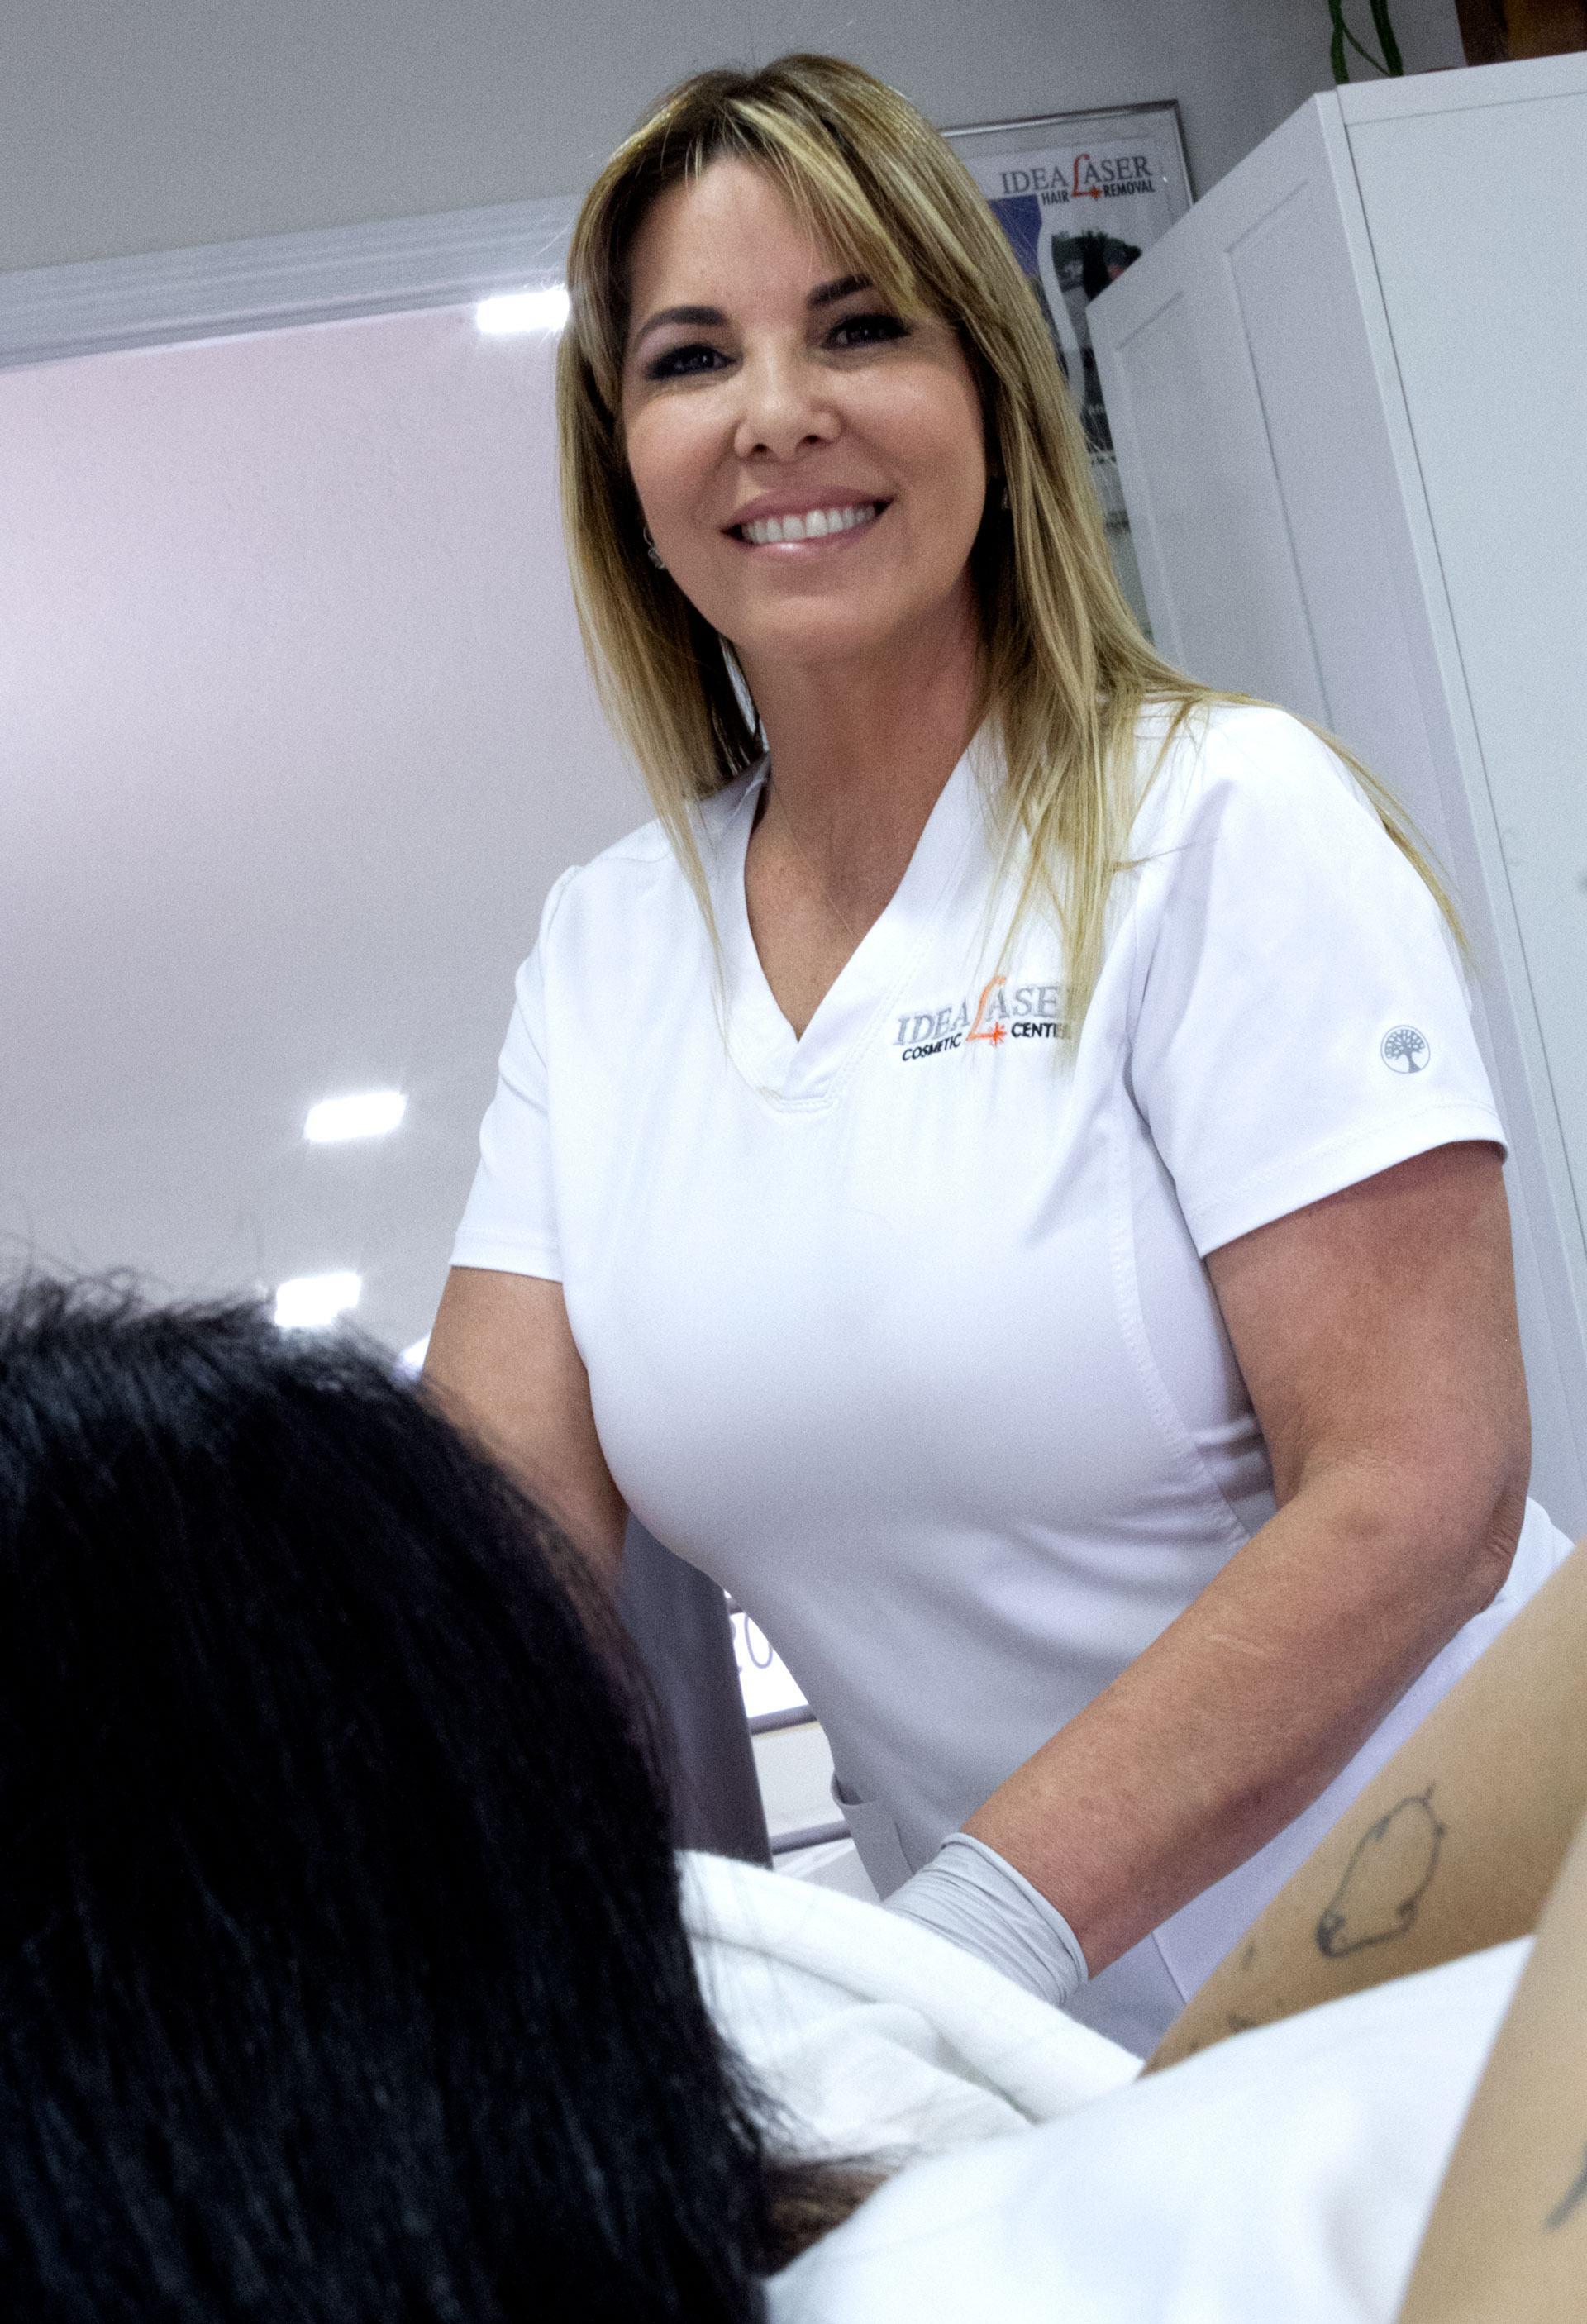 Idealaser cosmetic center